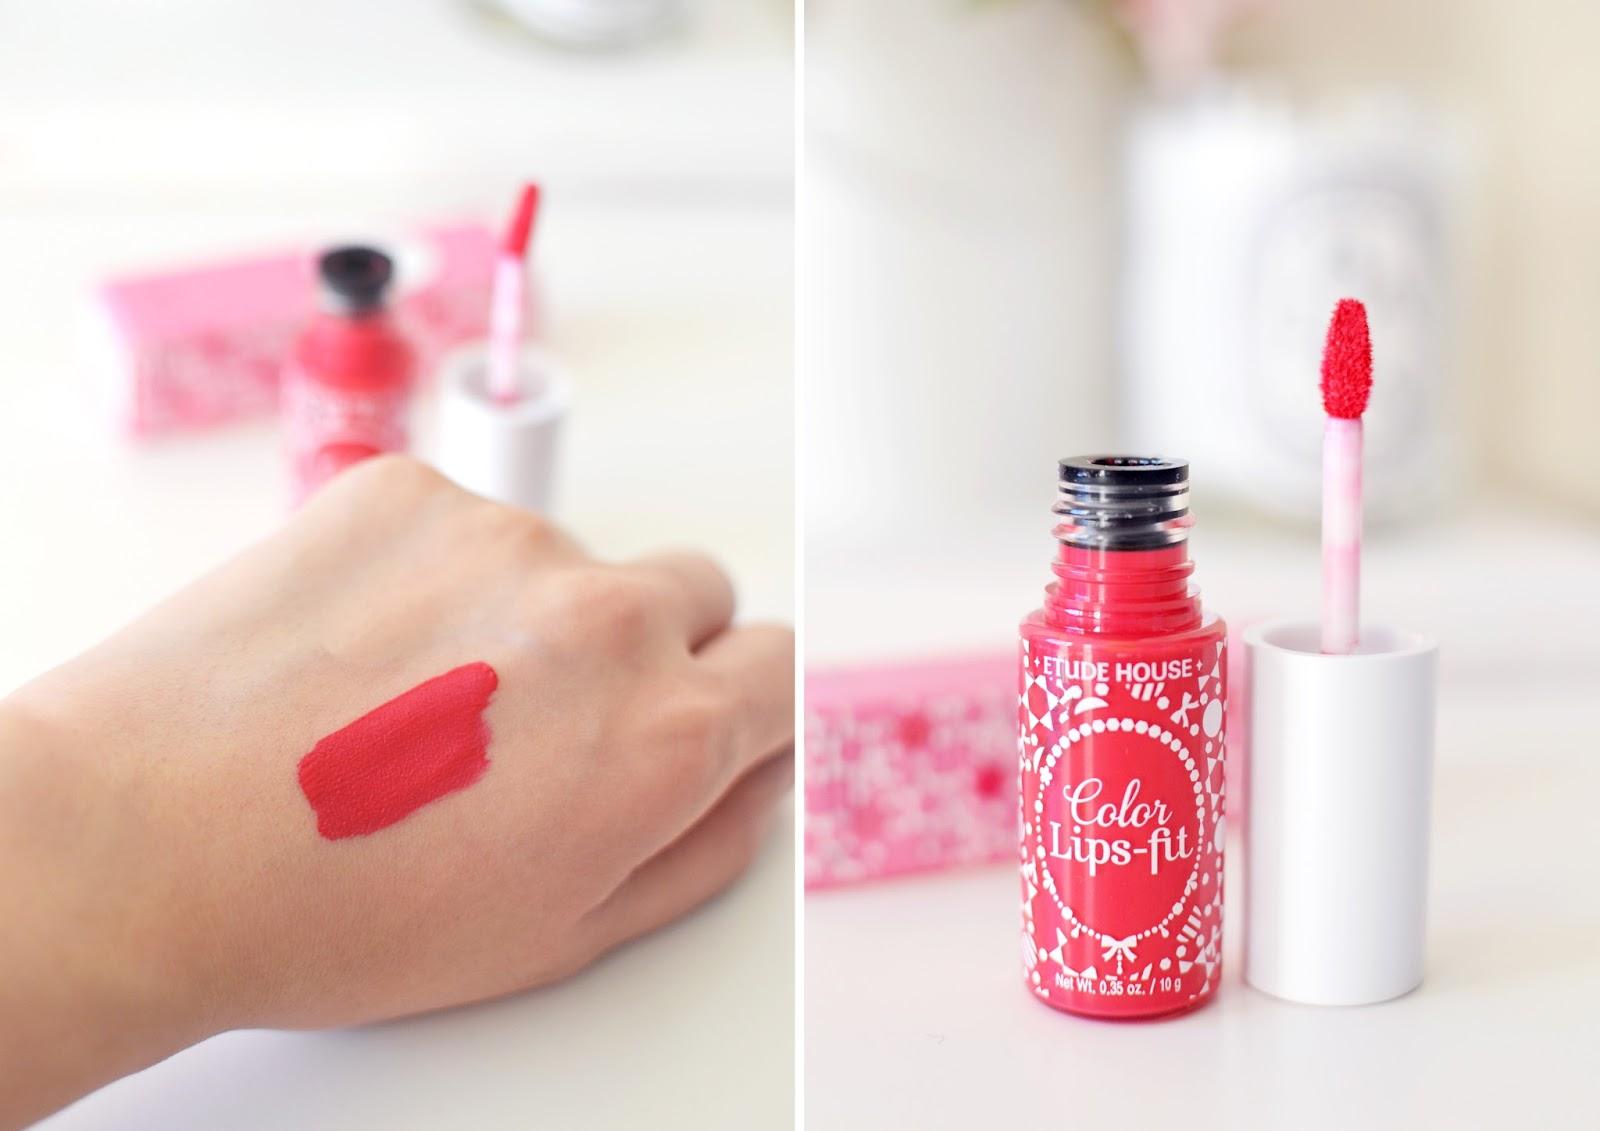 etude house, etude house lips fit, korean beauty products